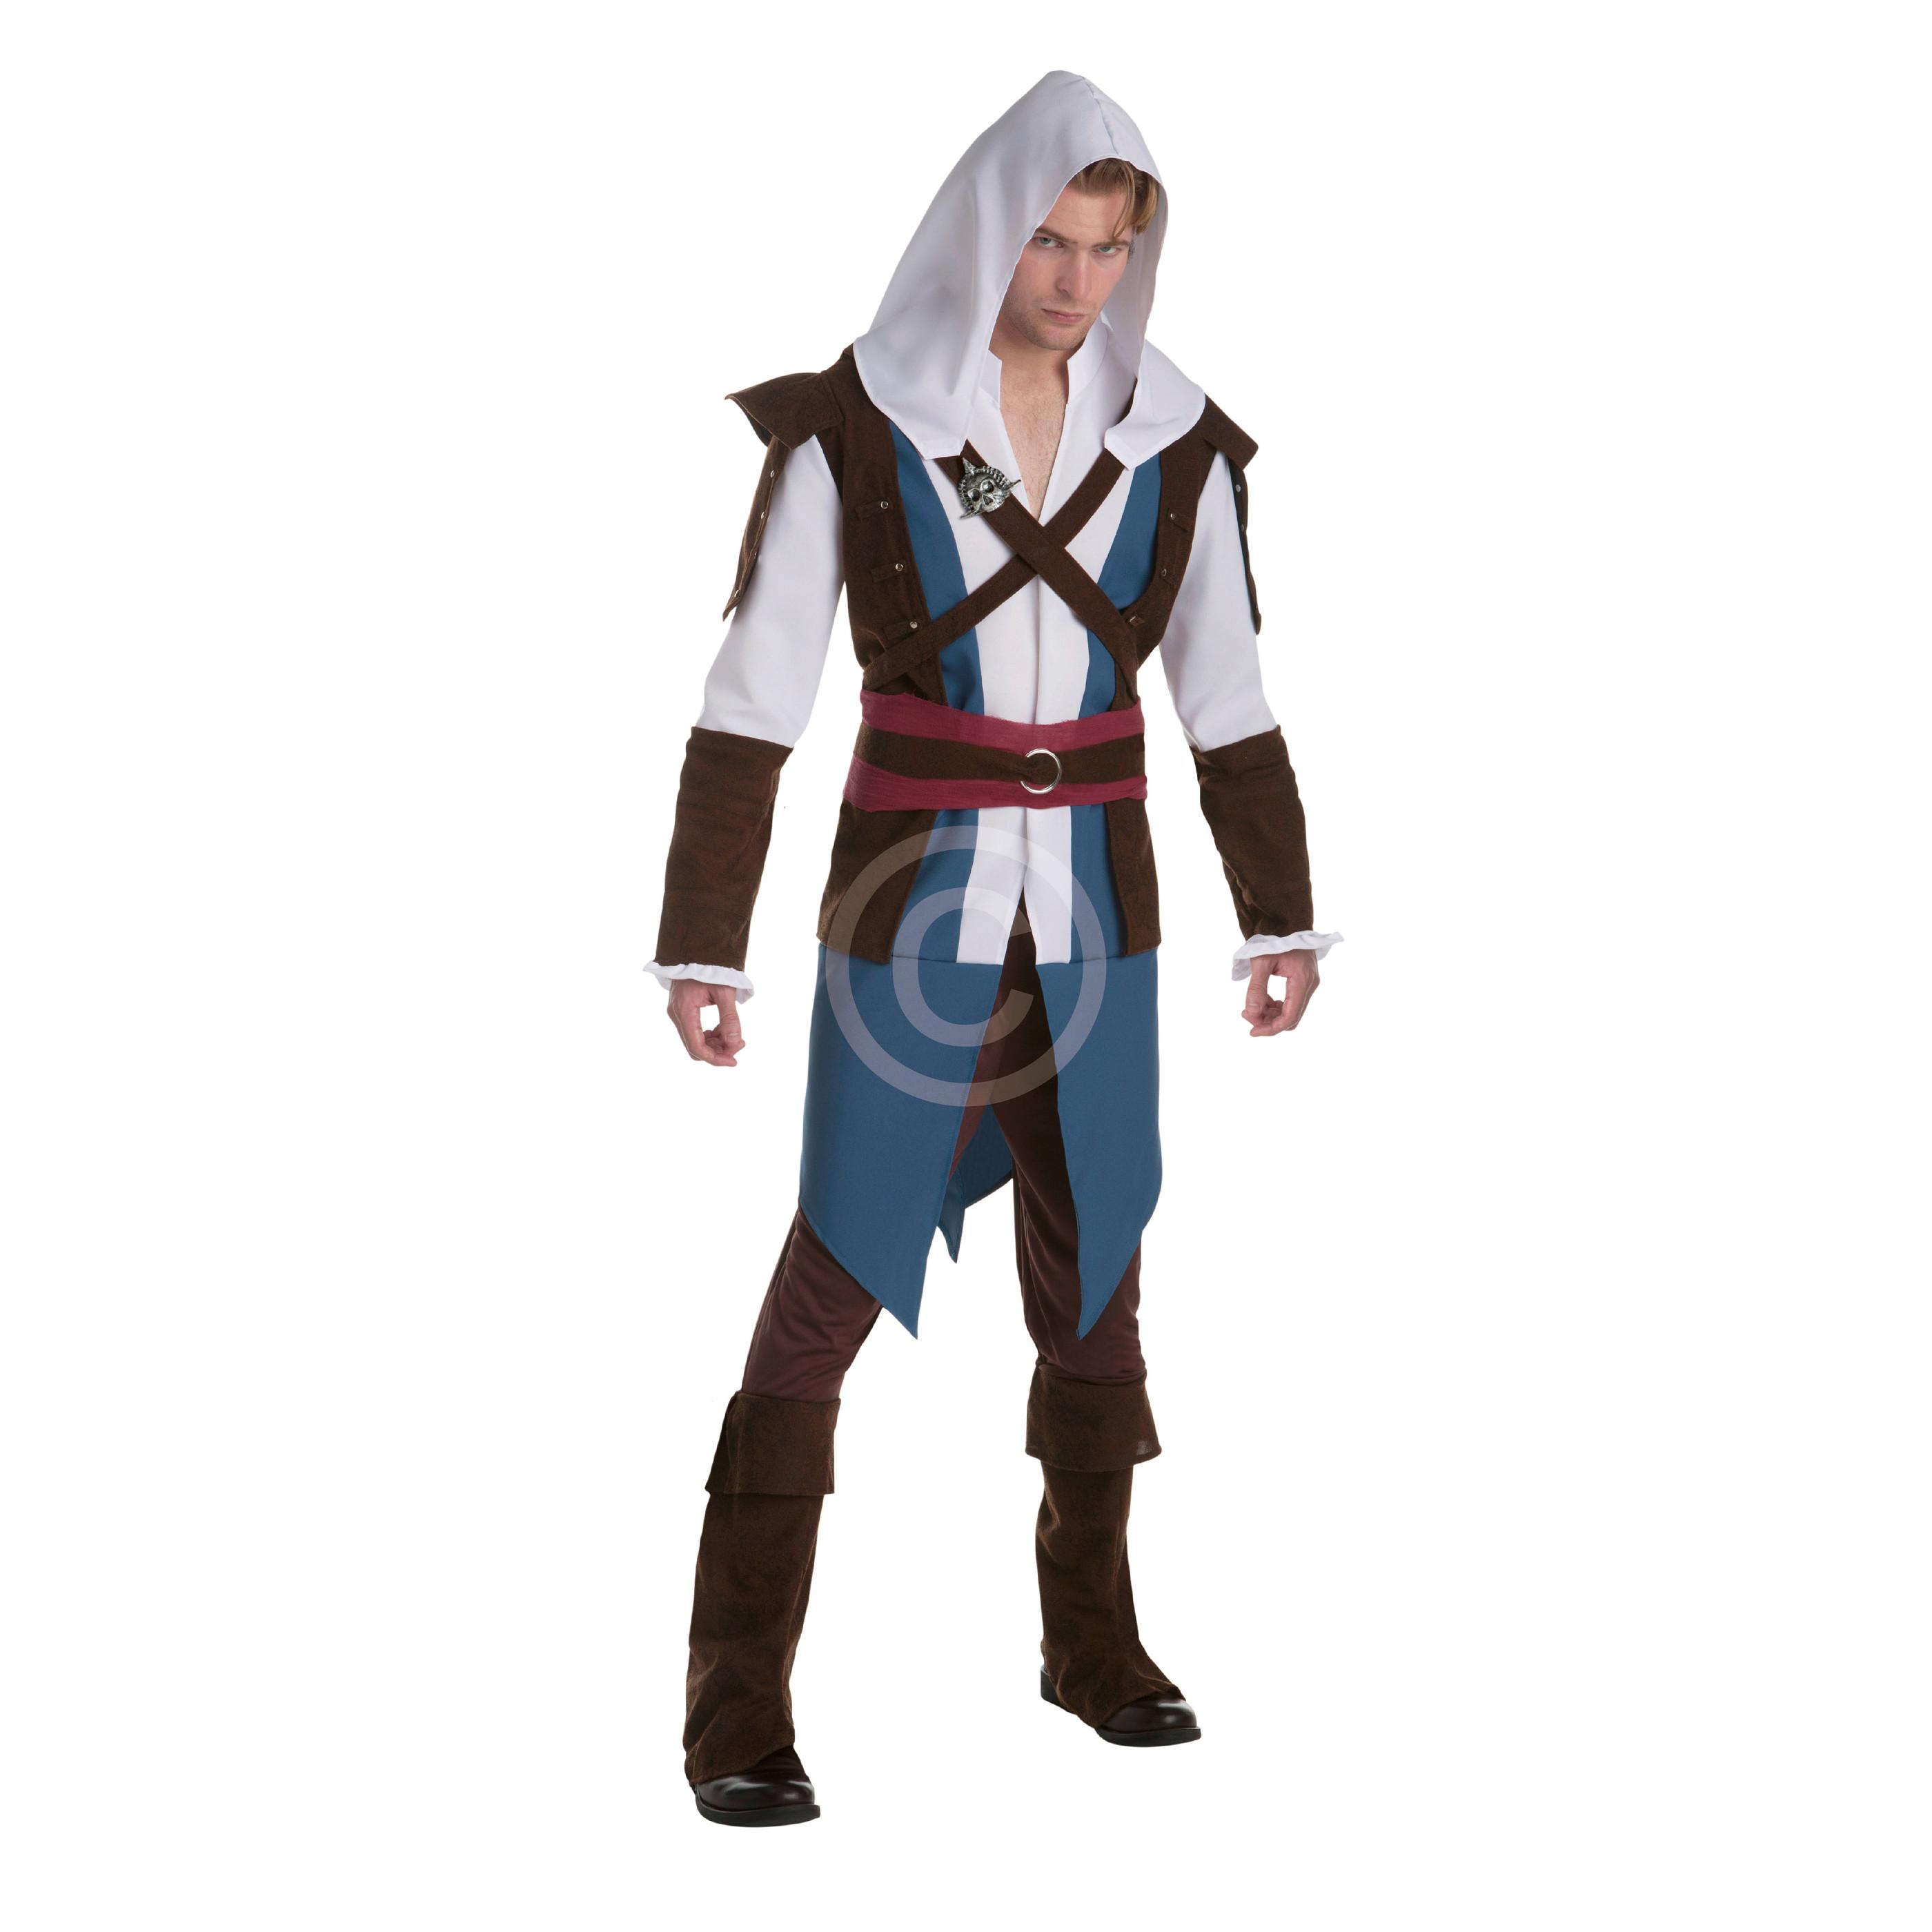 Costume edward kenway assassins creed adulto u2013 taglia l shop